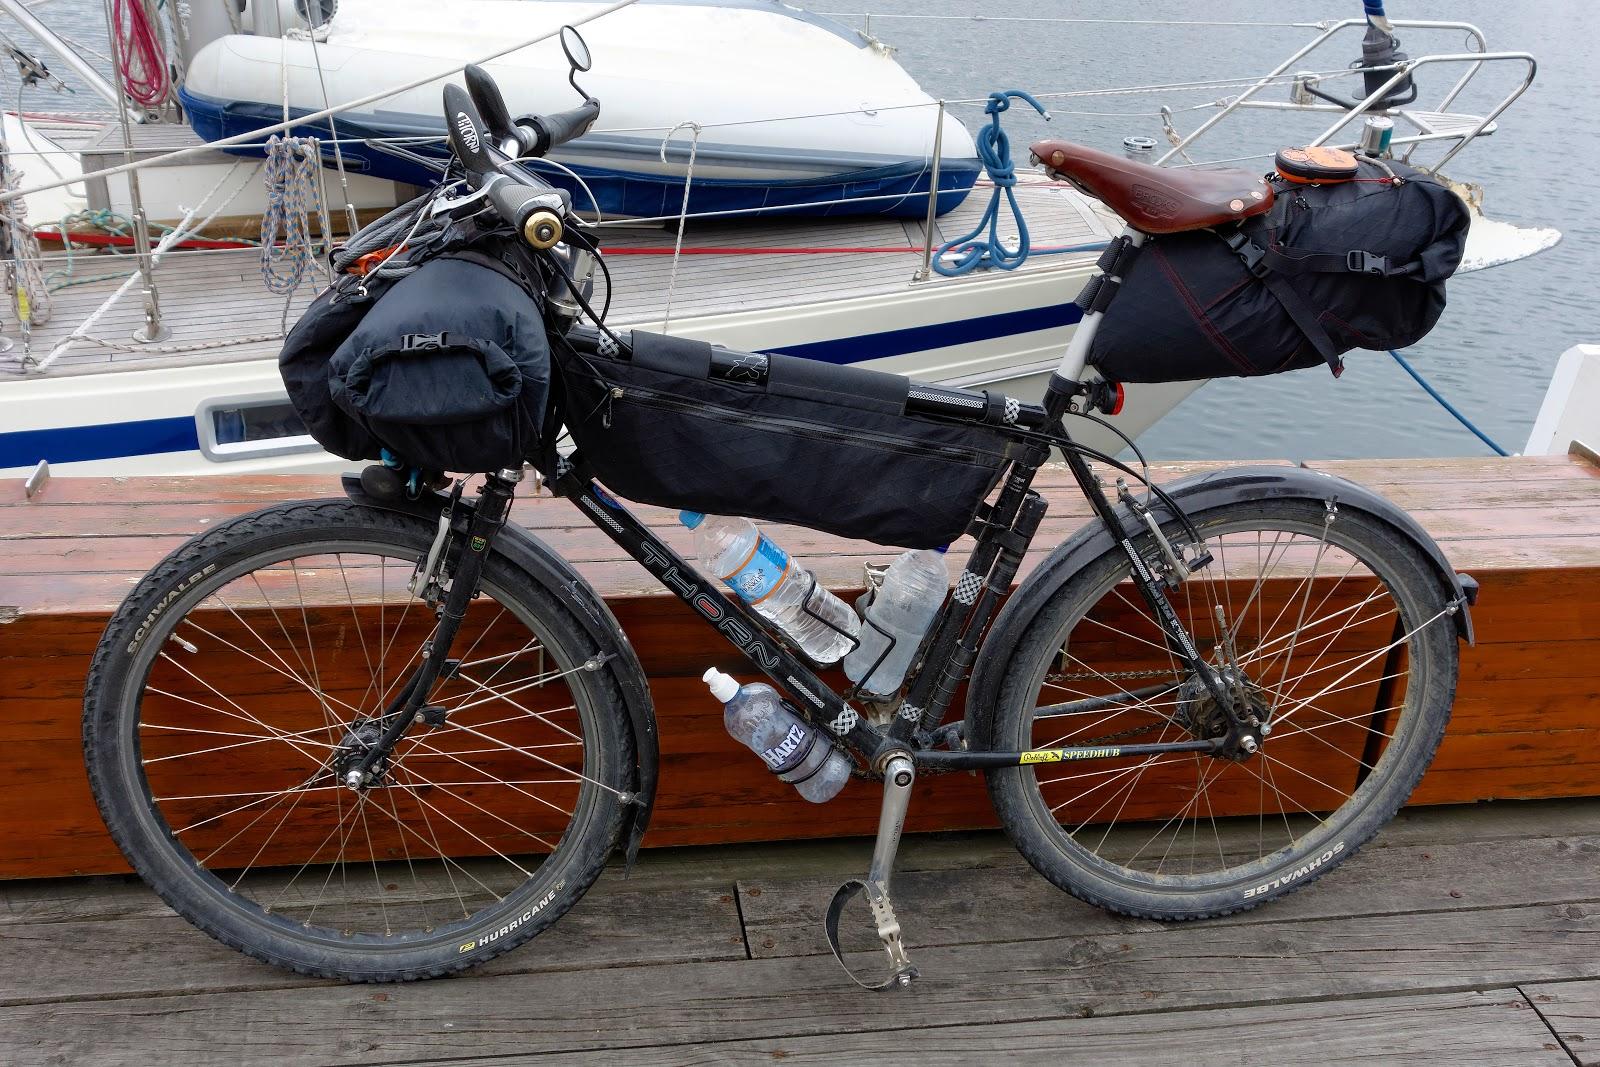 Tramplite Gear Revelate Bike Bags Review